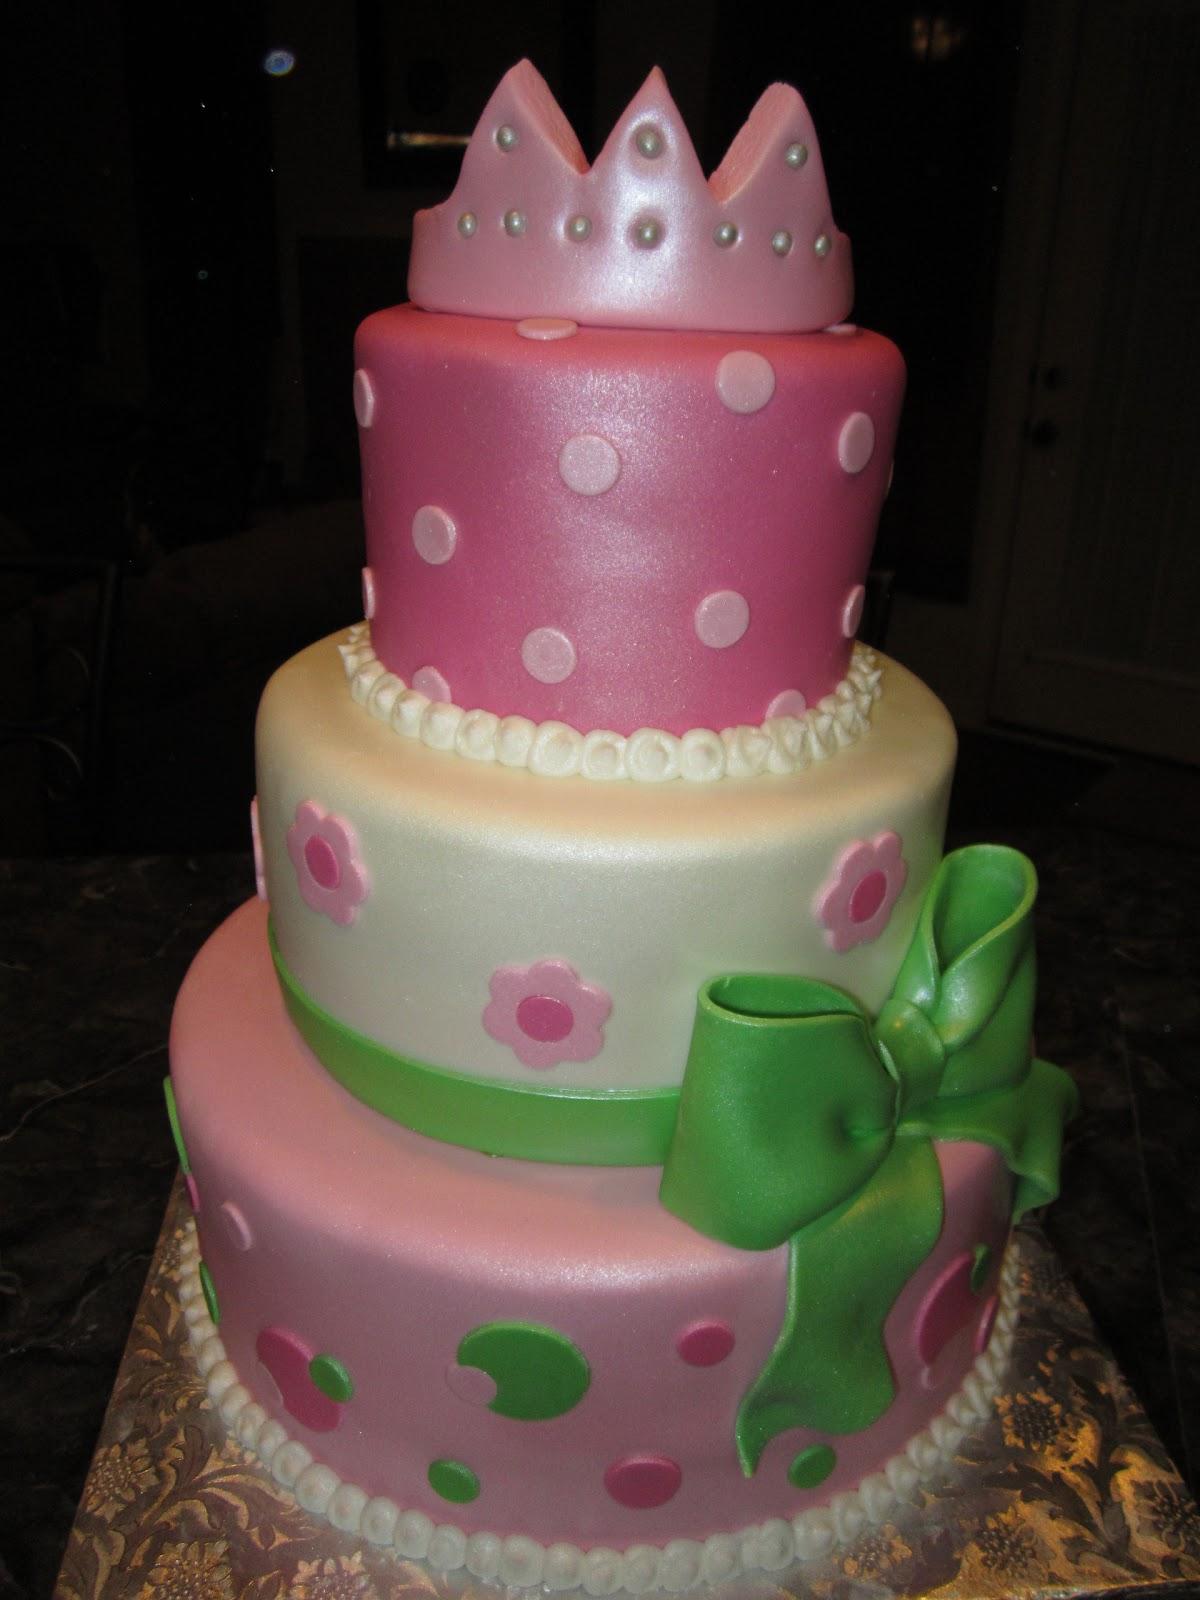 New Little Princess Baby Shower Cake